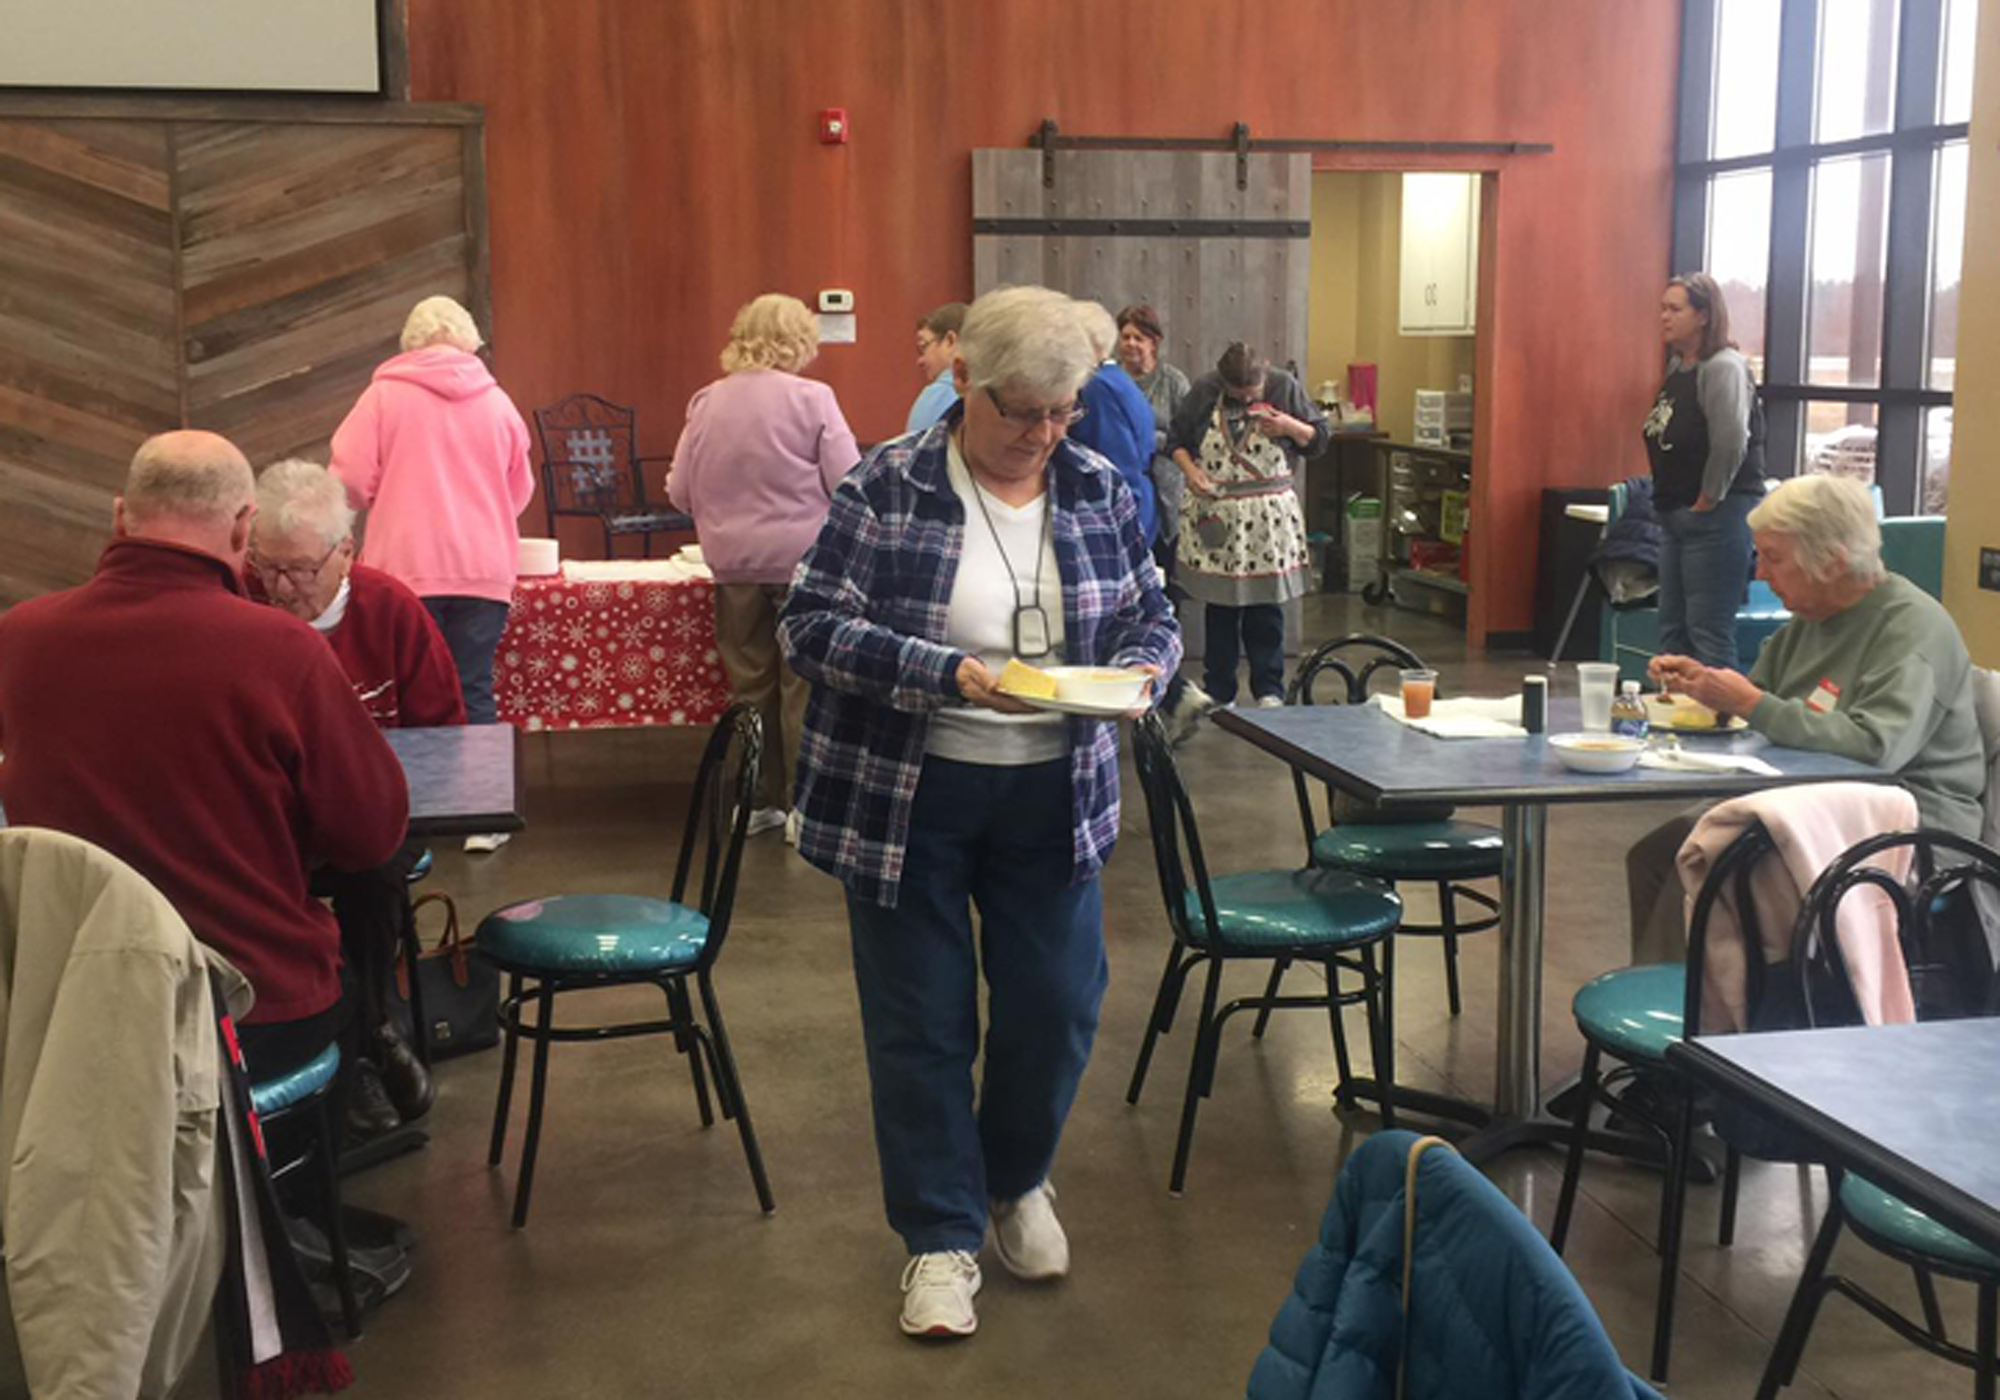 Community Foundation Awards $1,550 Grant to Brownsburg Older Adult Alliance